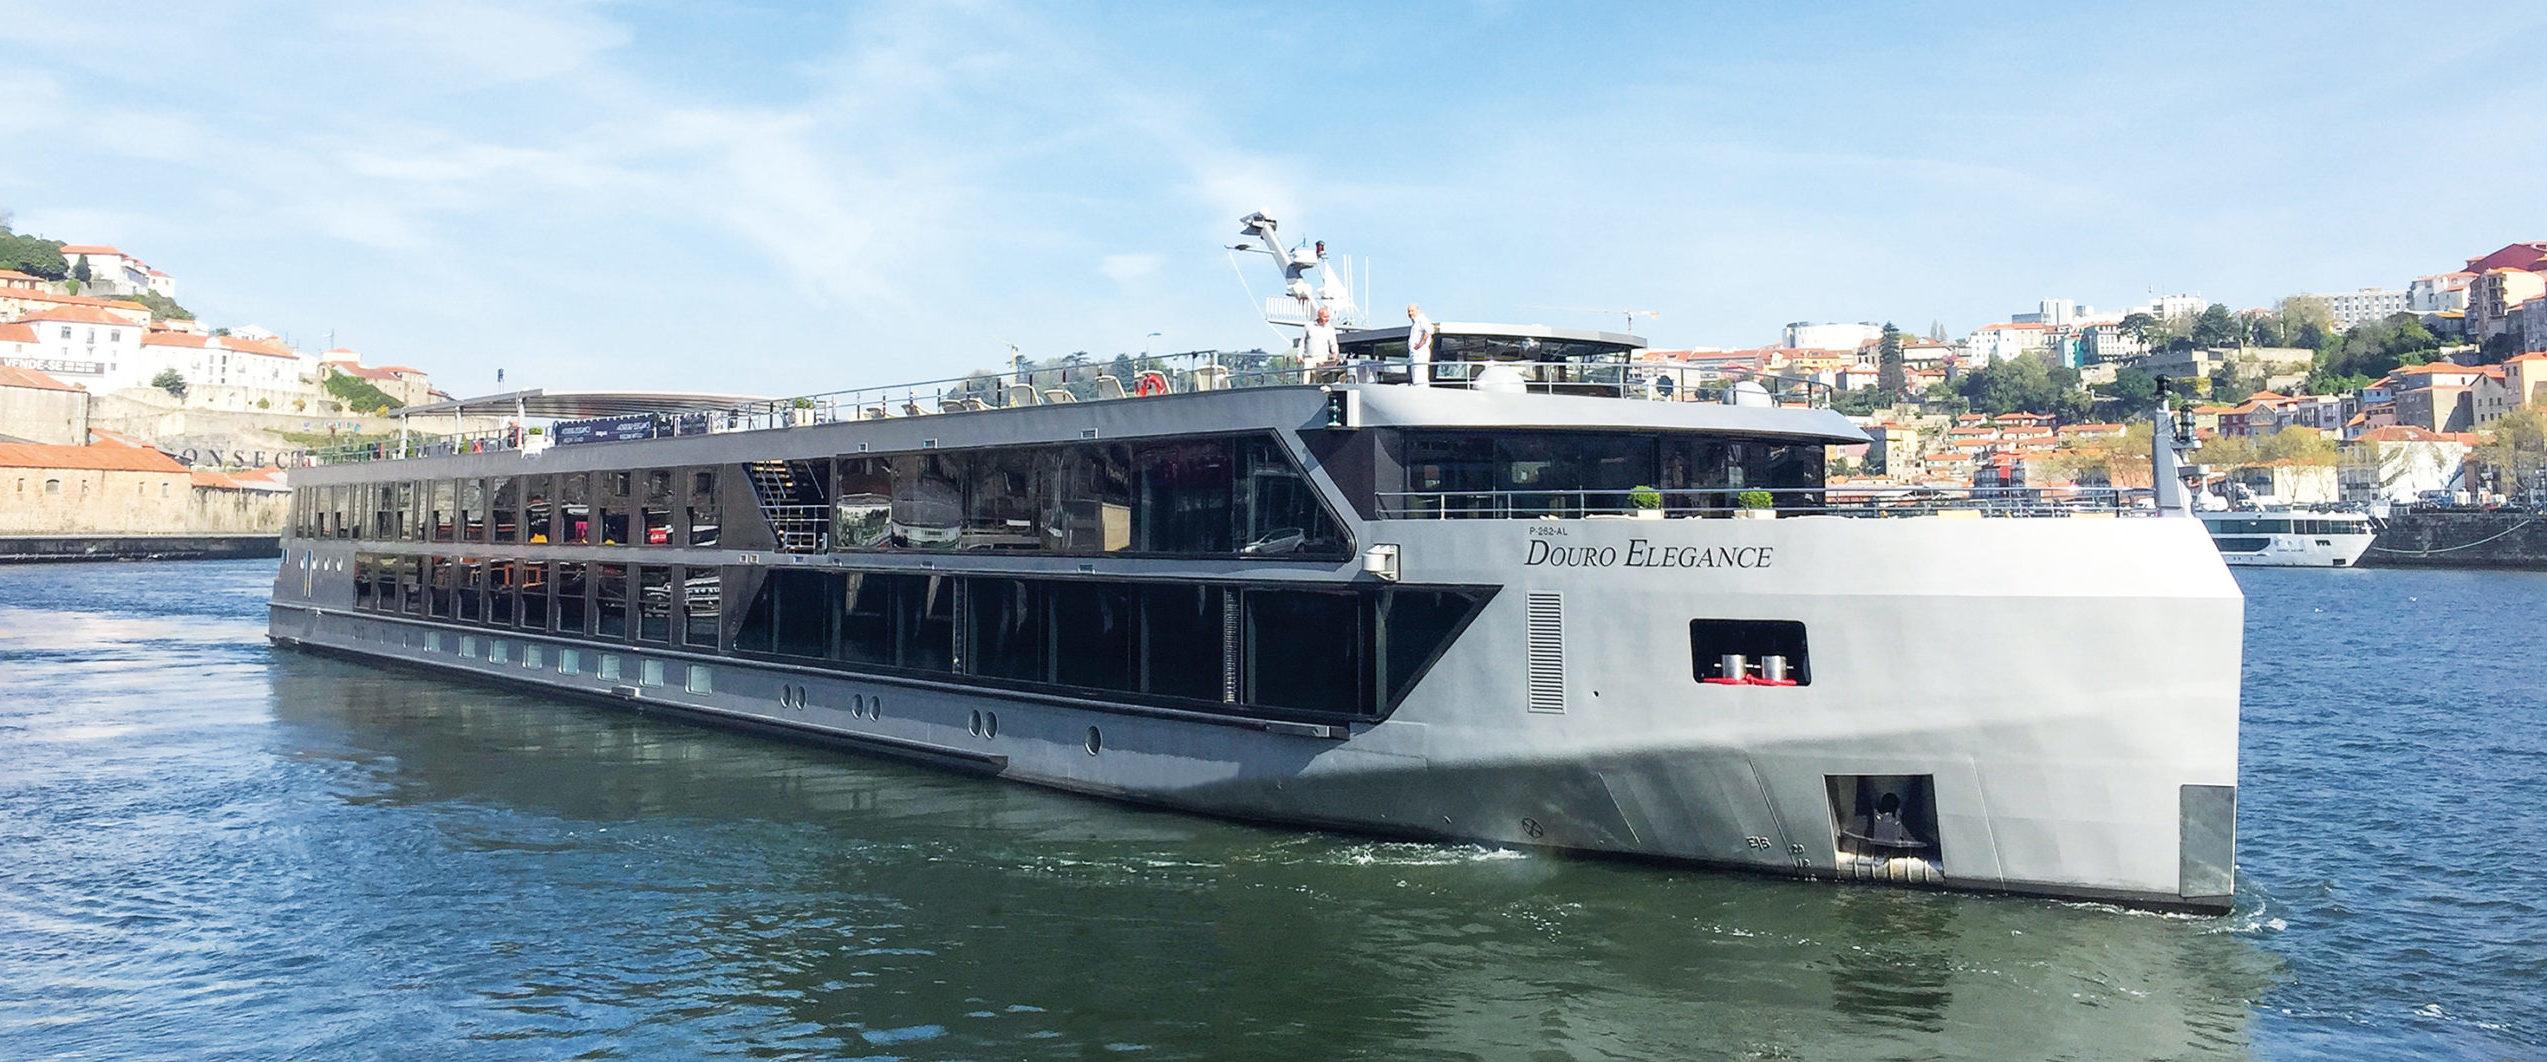 Riviera River Cruises: Douro Elegance